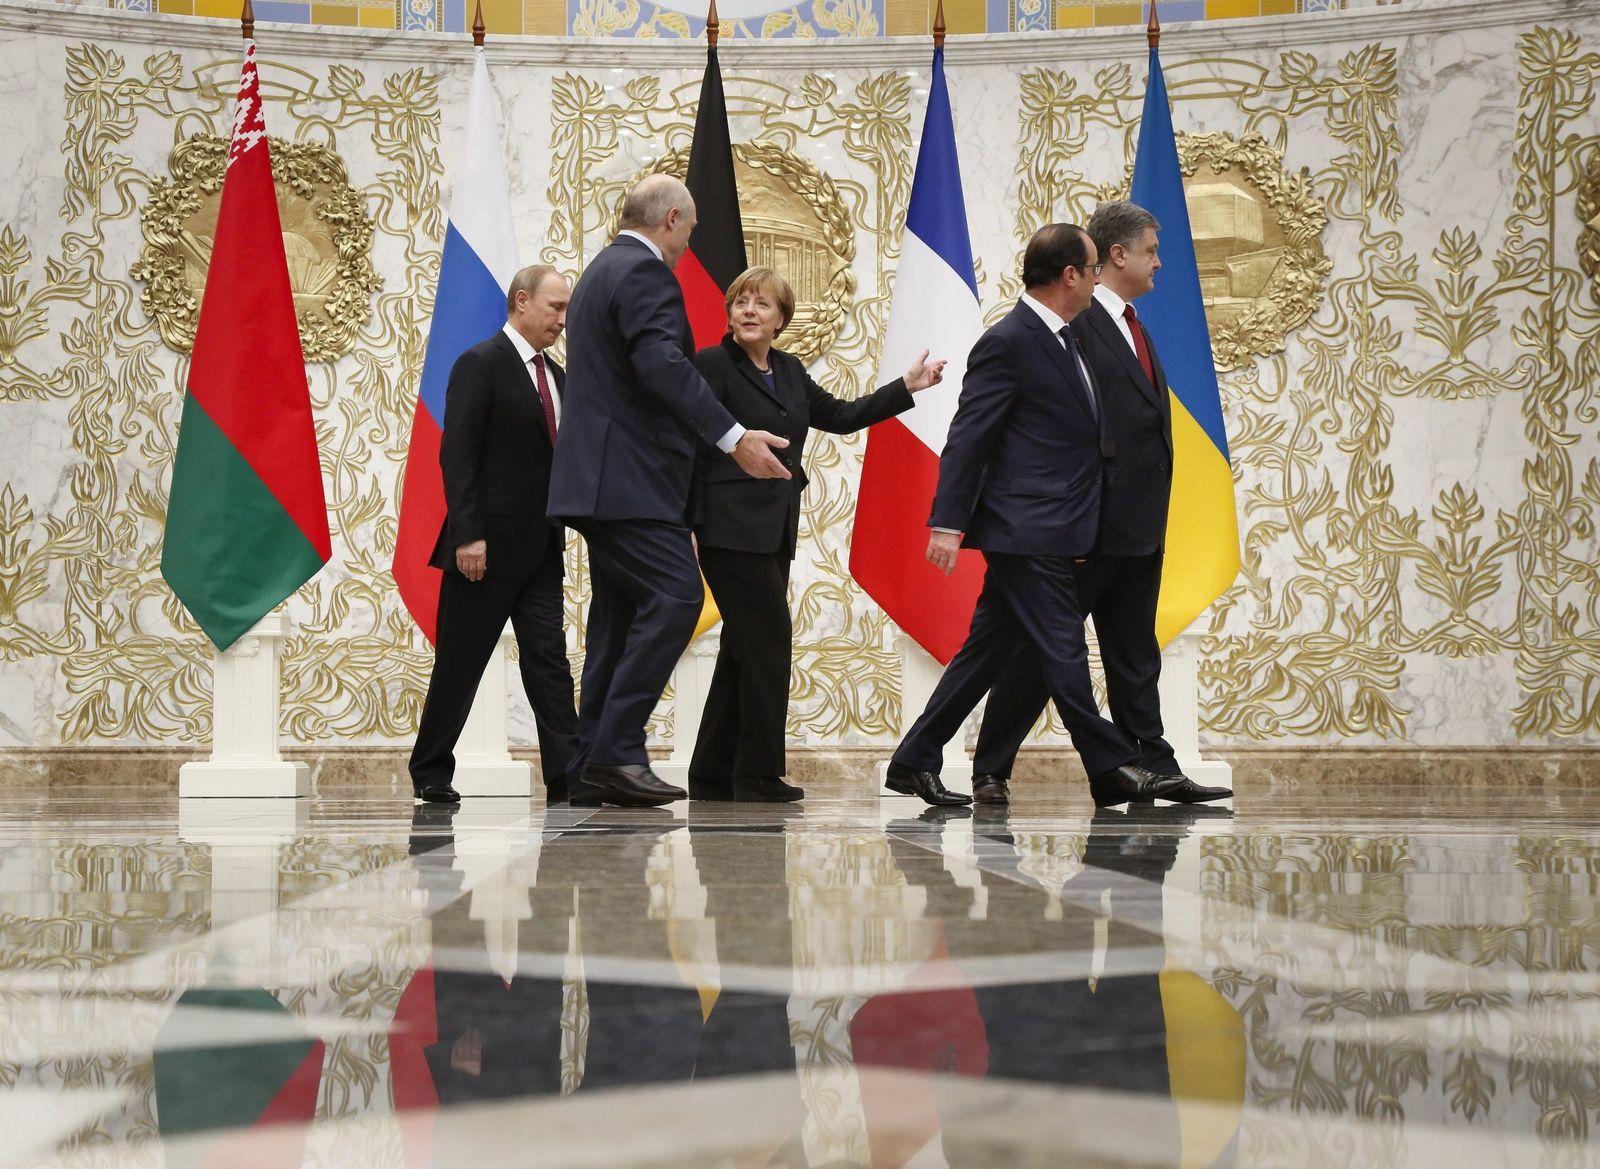 Angela Merkel / Wladimir Putin / Francois Hollande / Alexander Lukashenko / Petro Poroshenko